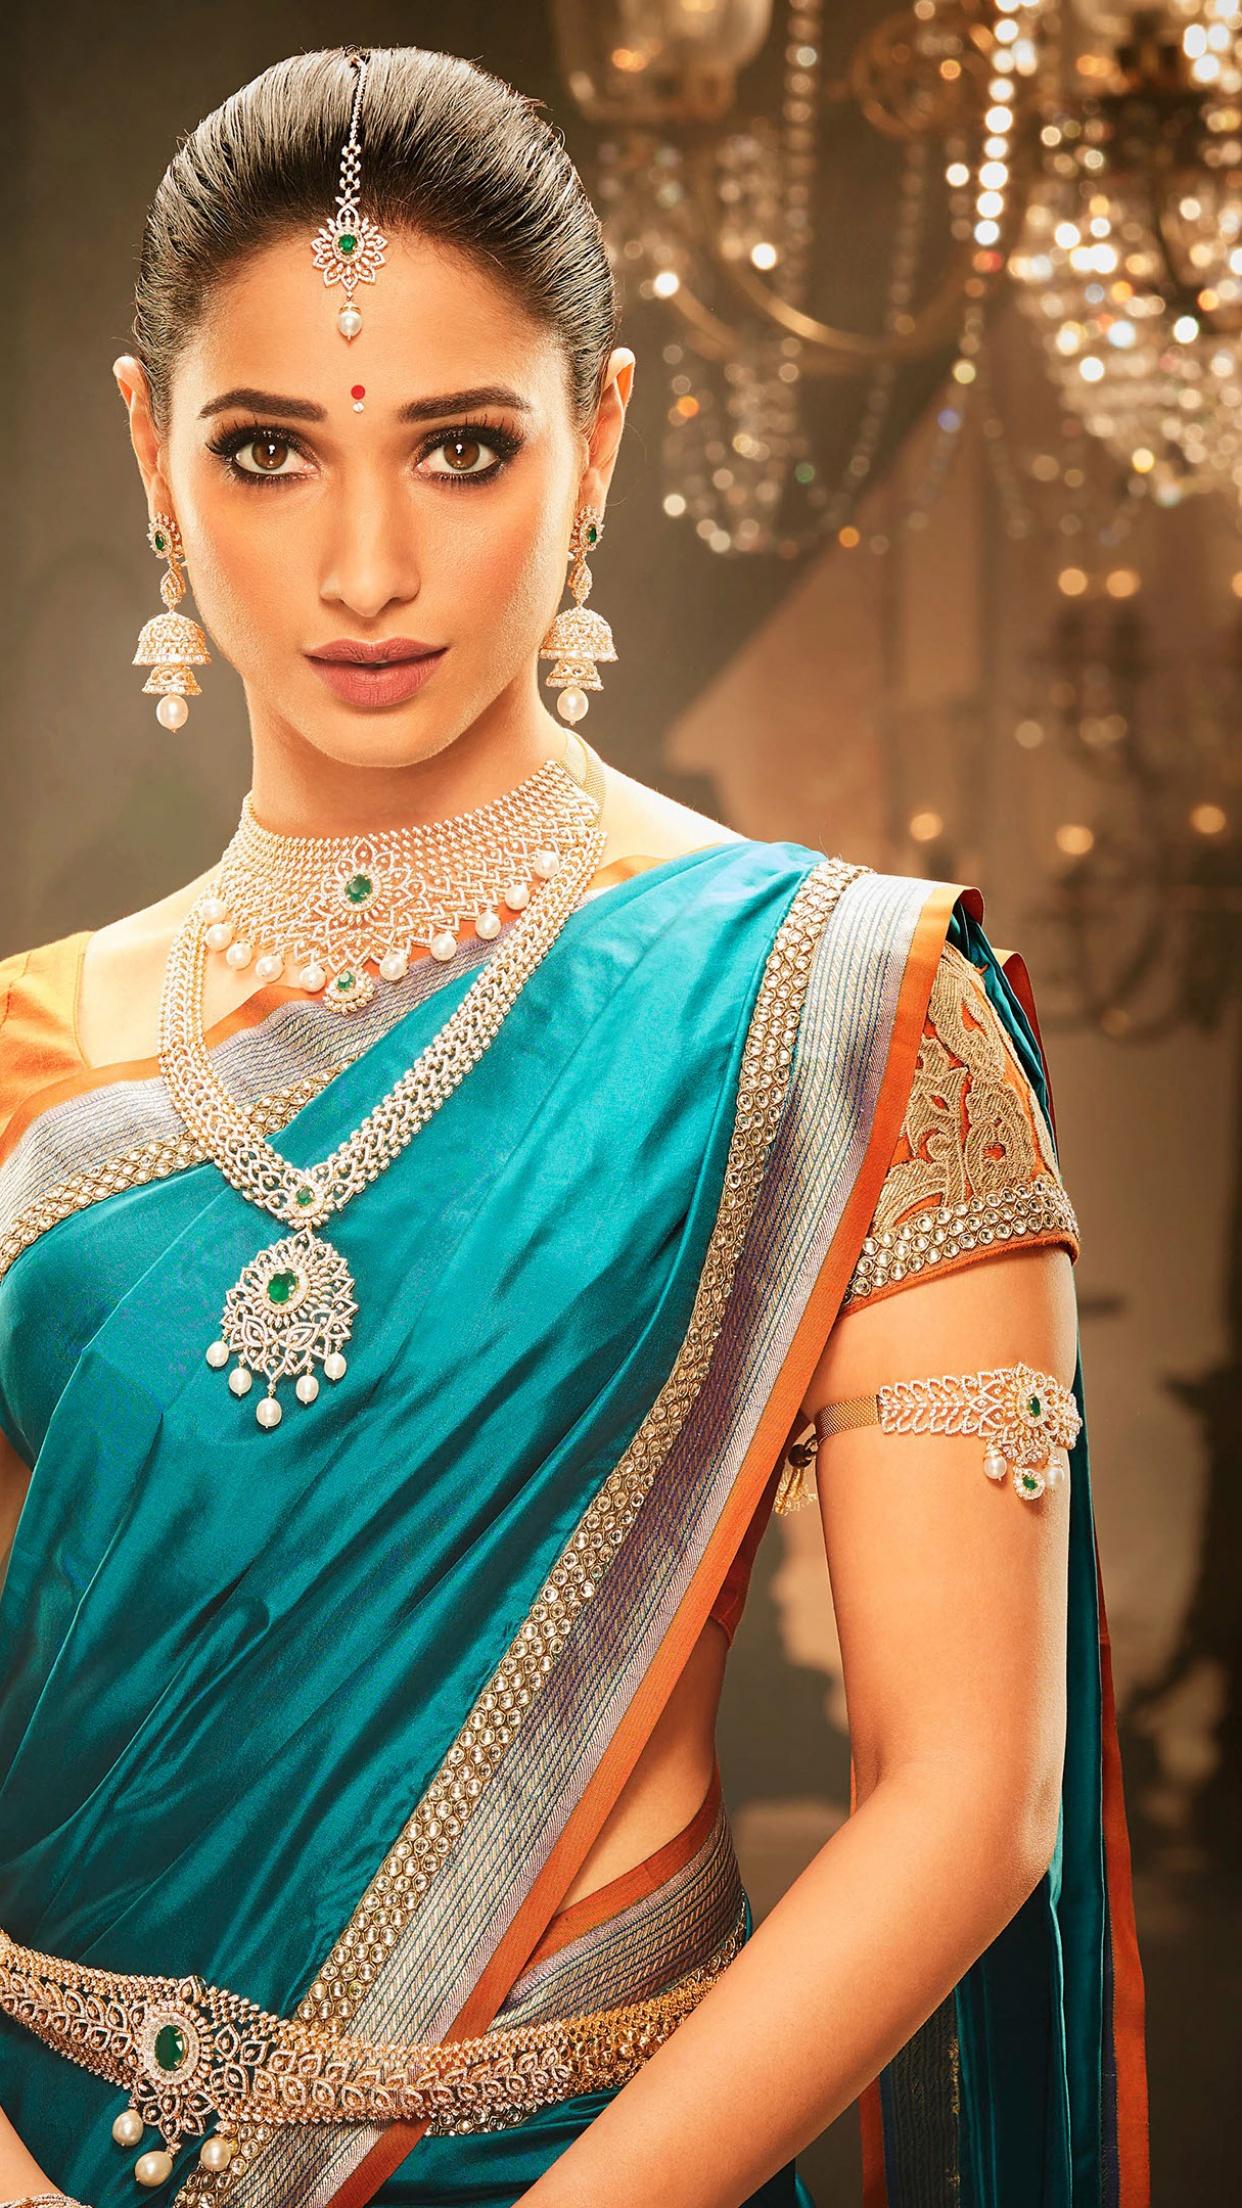 Unseen Hot Photos of Actresses: Malavika Unseen Hot Pics